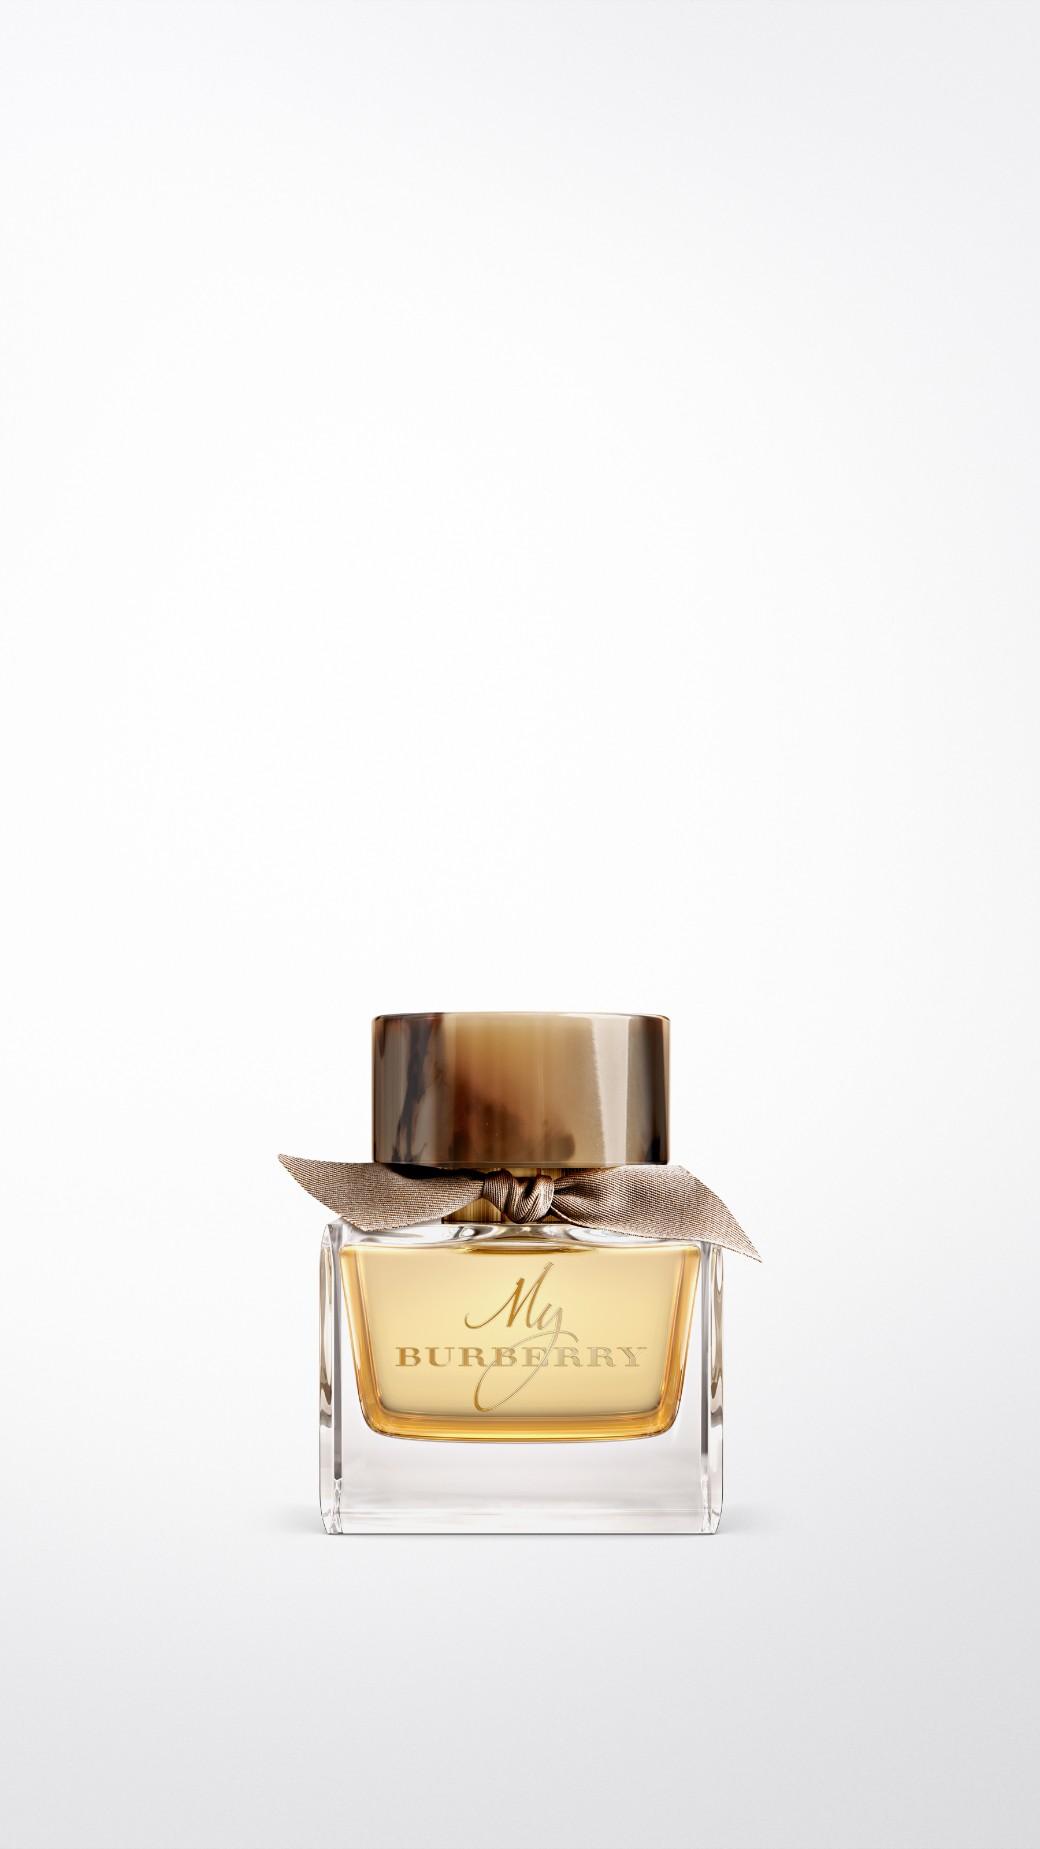 My Burberry Eau de Parfum 50ml